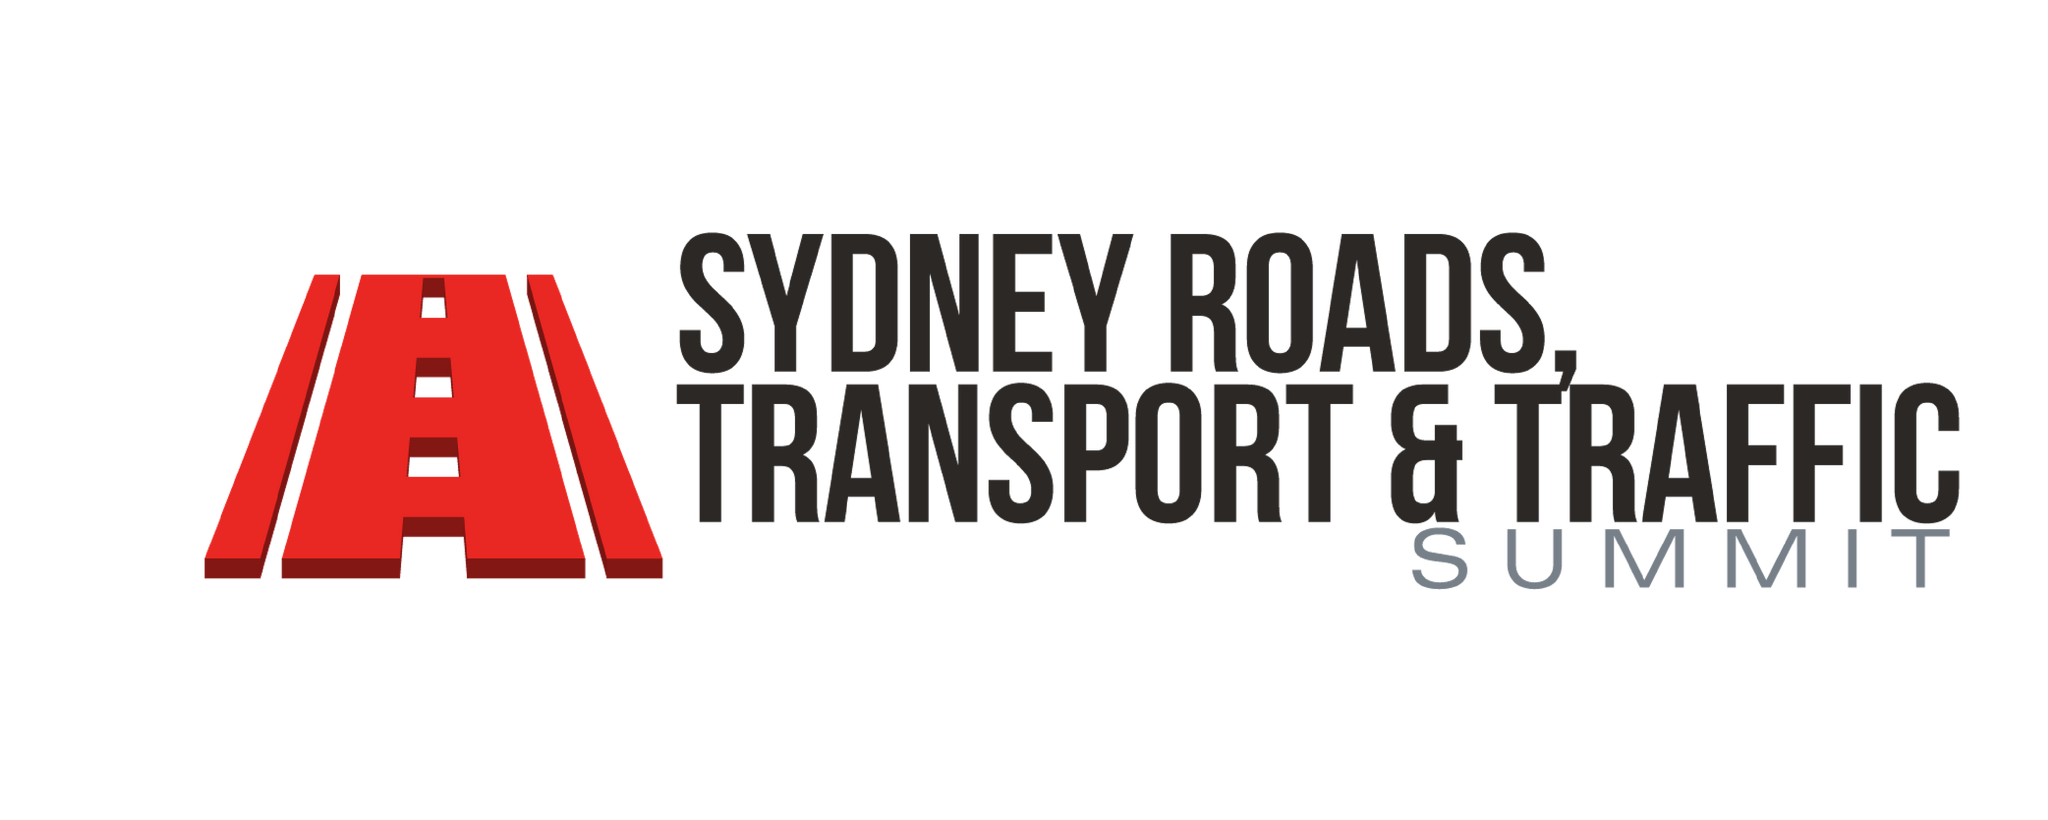 Roads, Transport & Traffic Topics & Presentations: